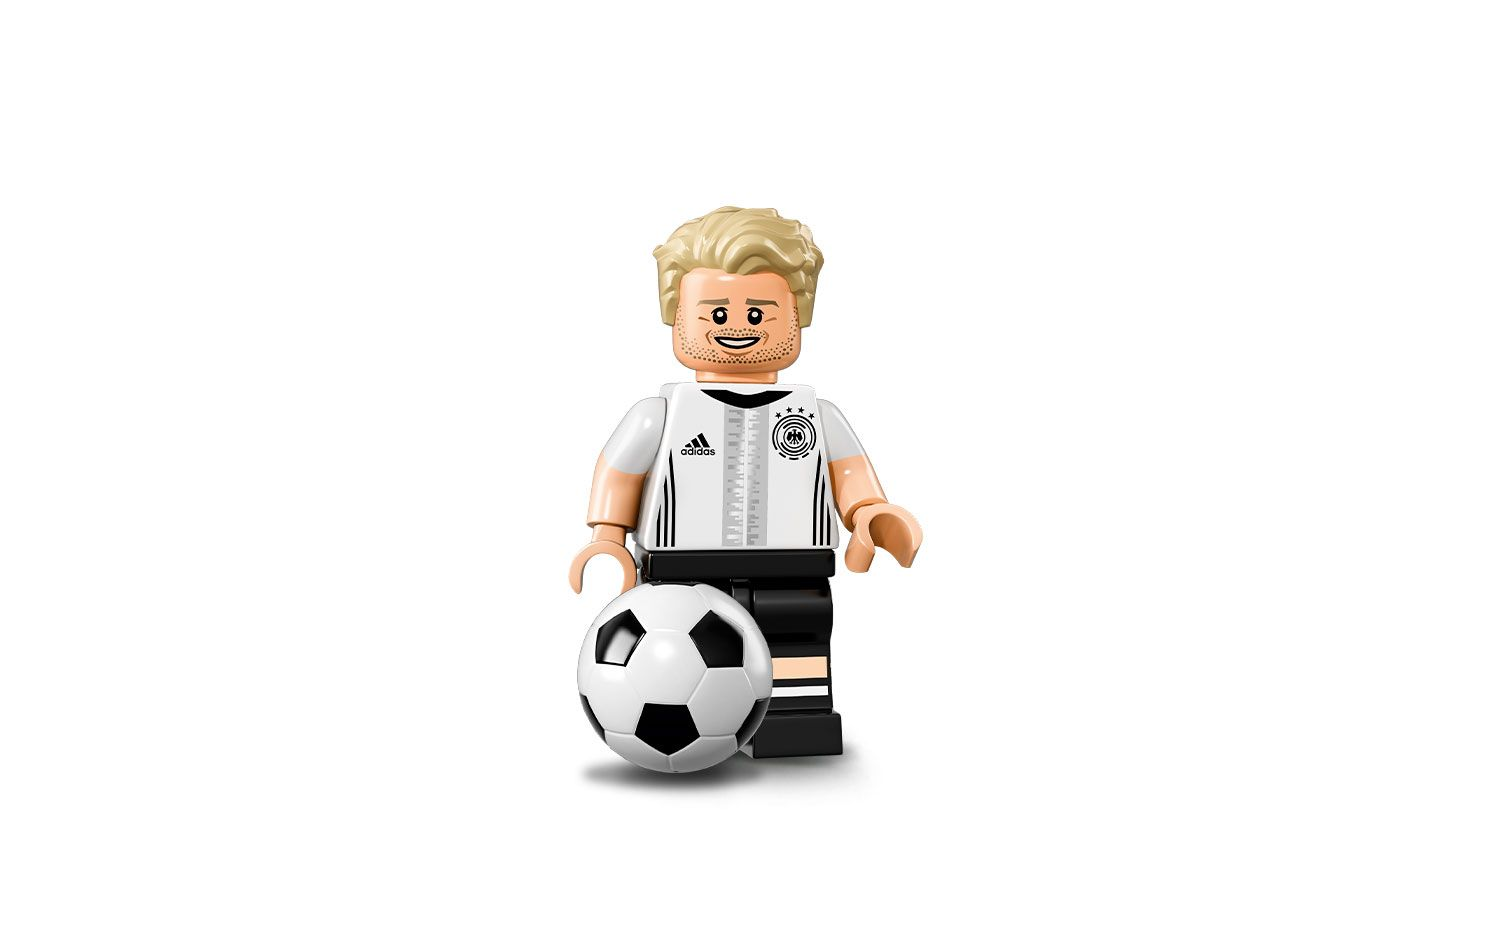 Andre Schurrle Spielfiguren Lego Football Germany Team Lego Star Wars